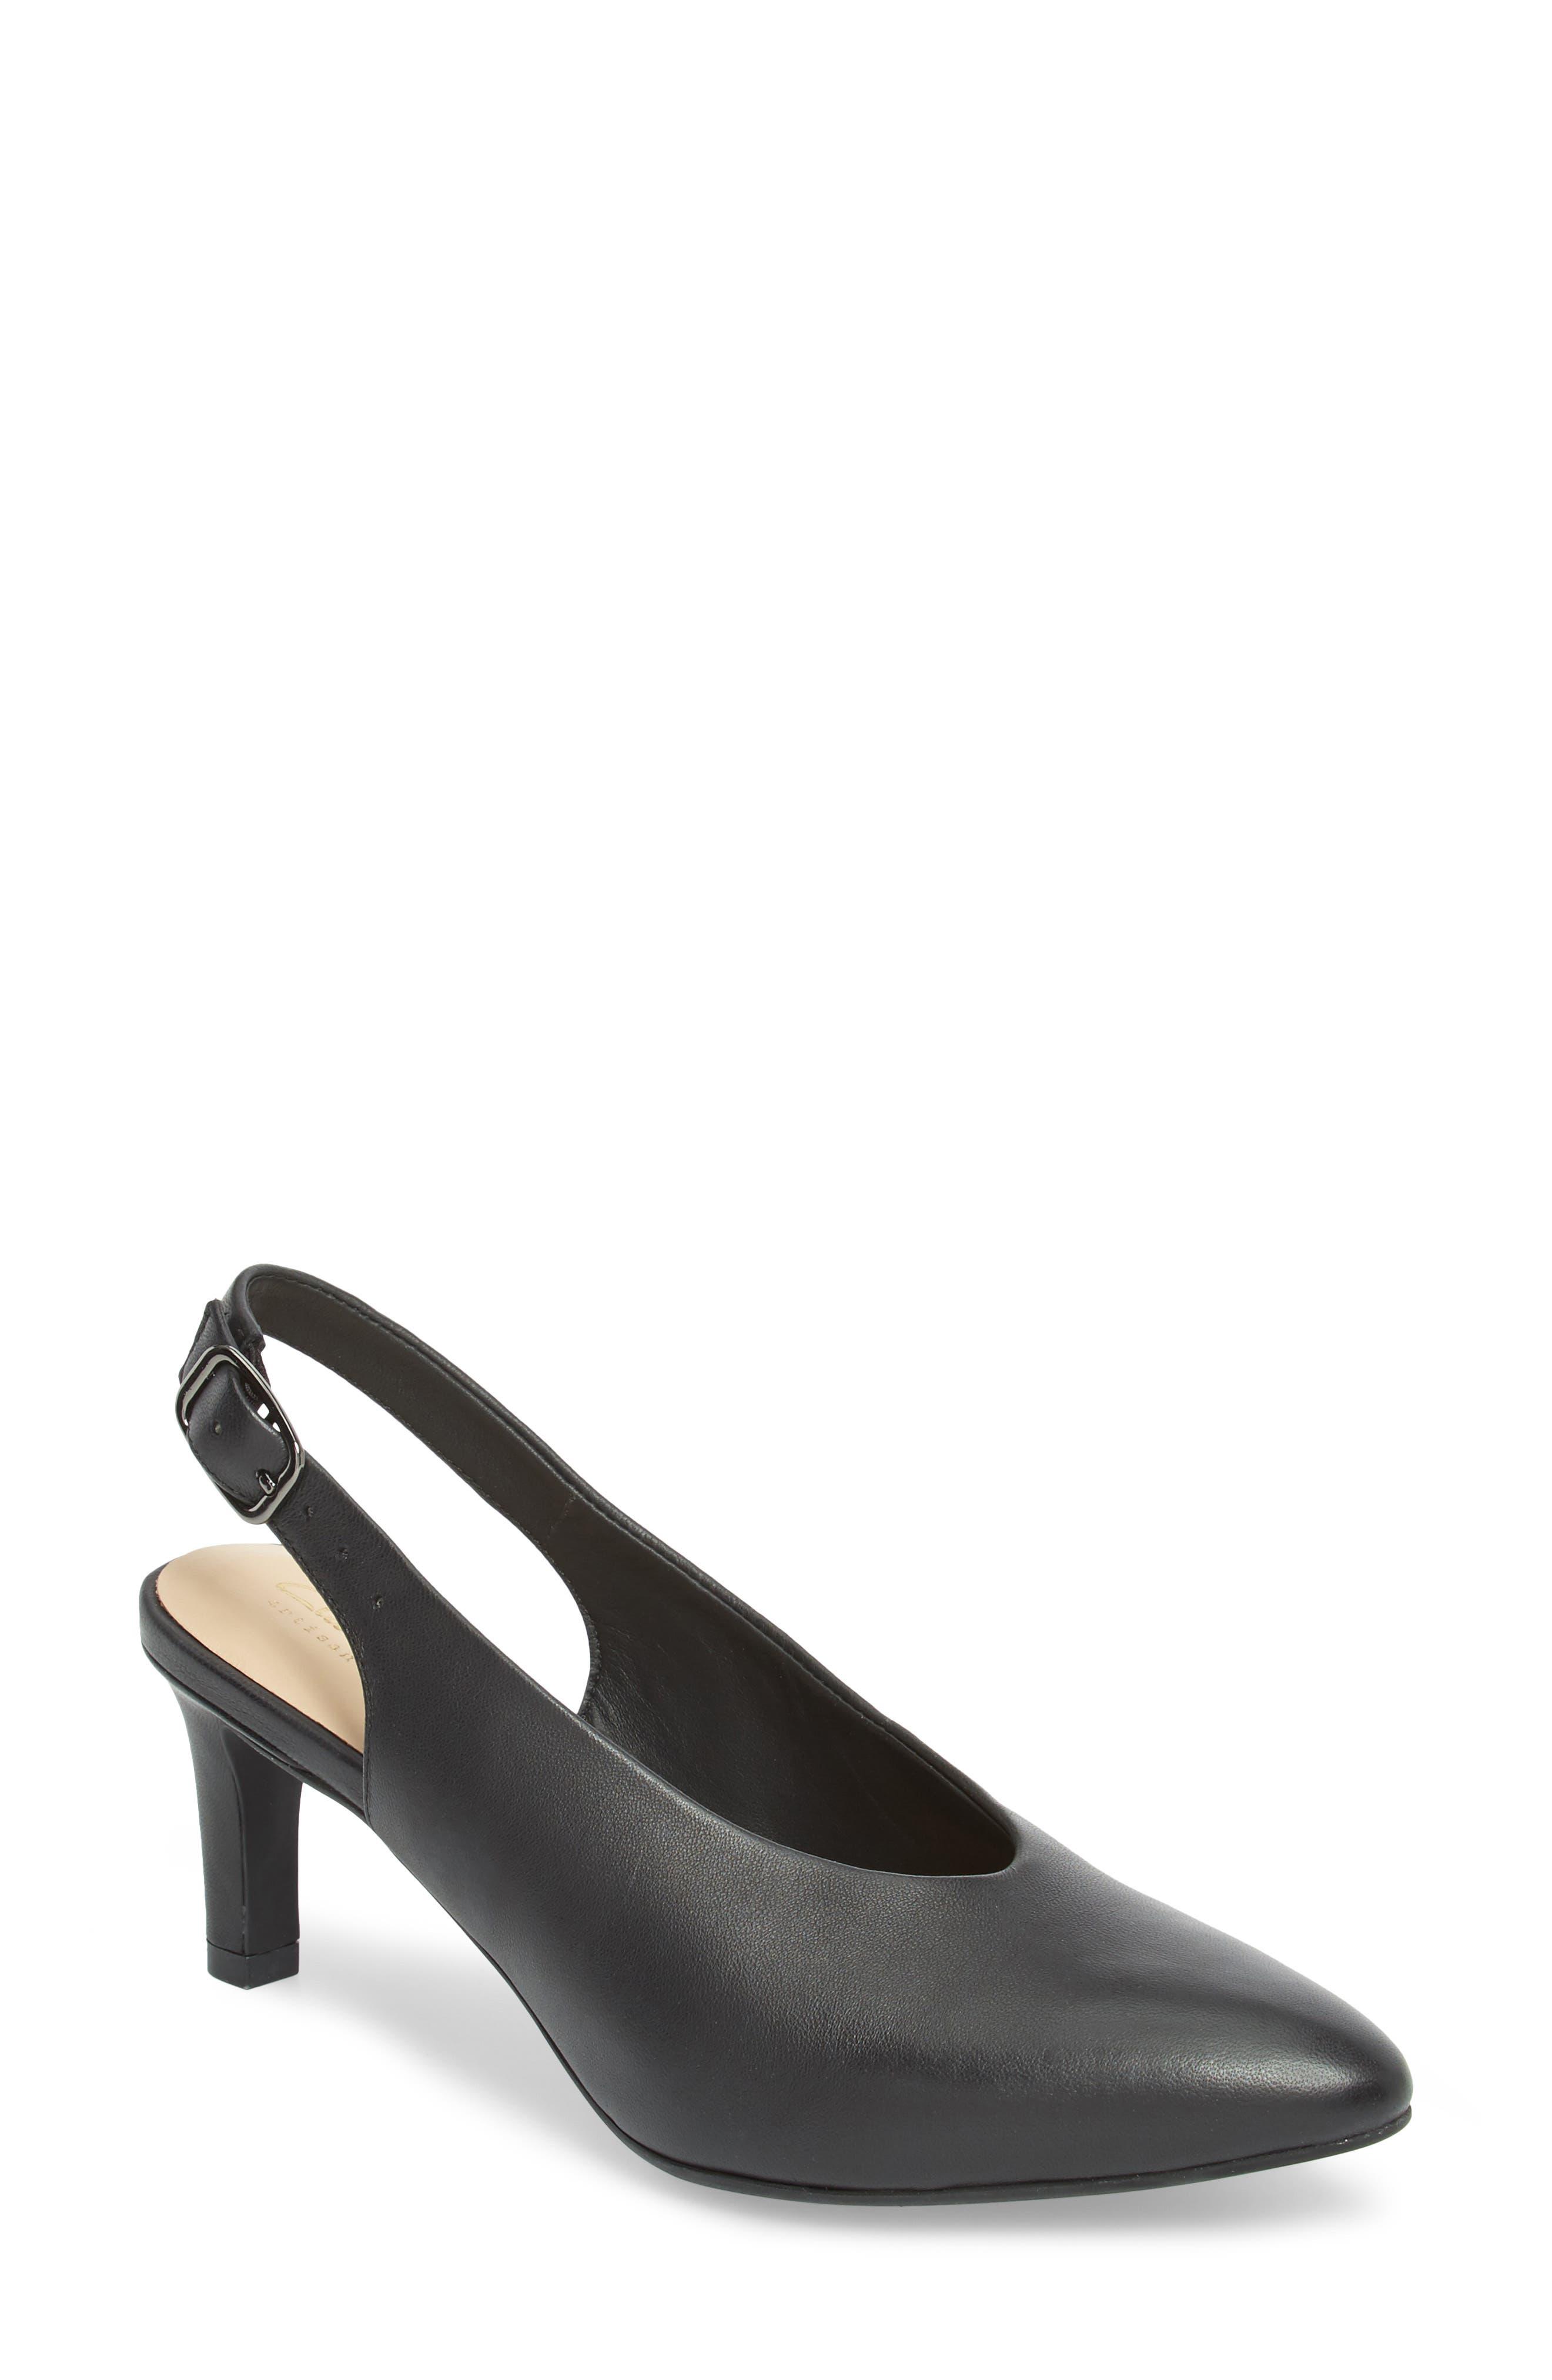 Calla Violet Kitten Heel Pump,                             Main thumbnail 1, color,                             Black Leather